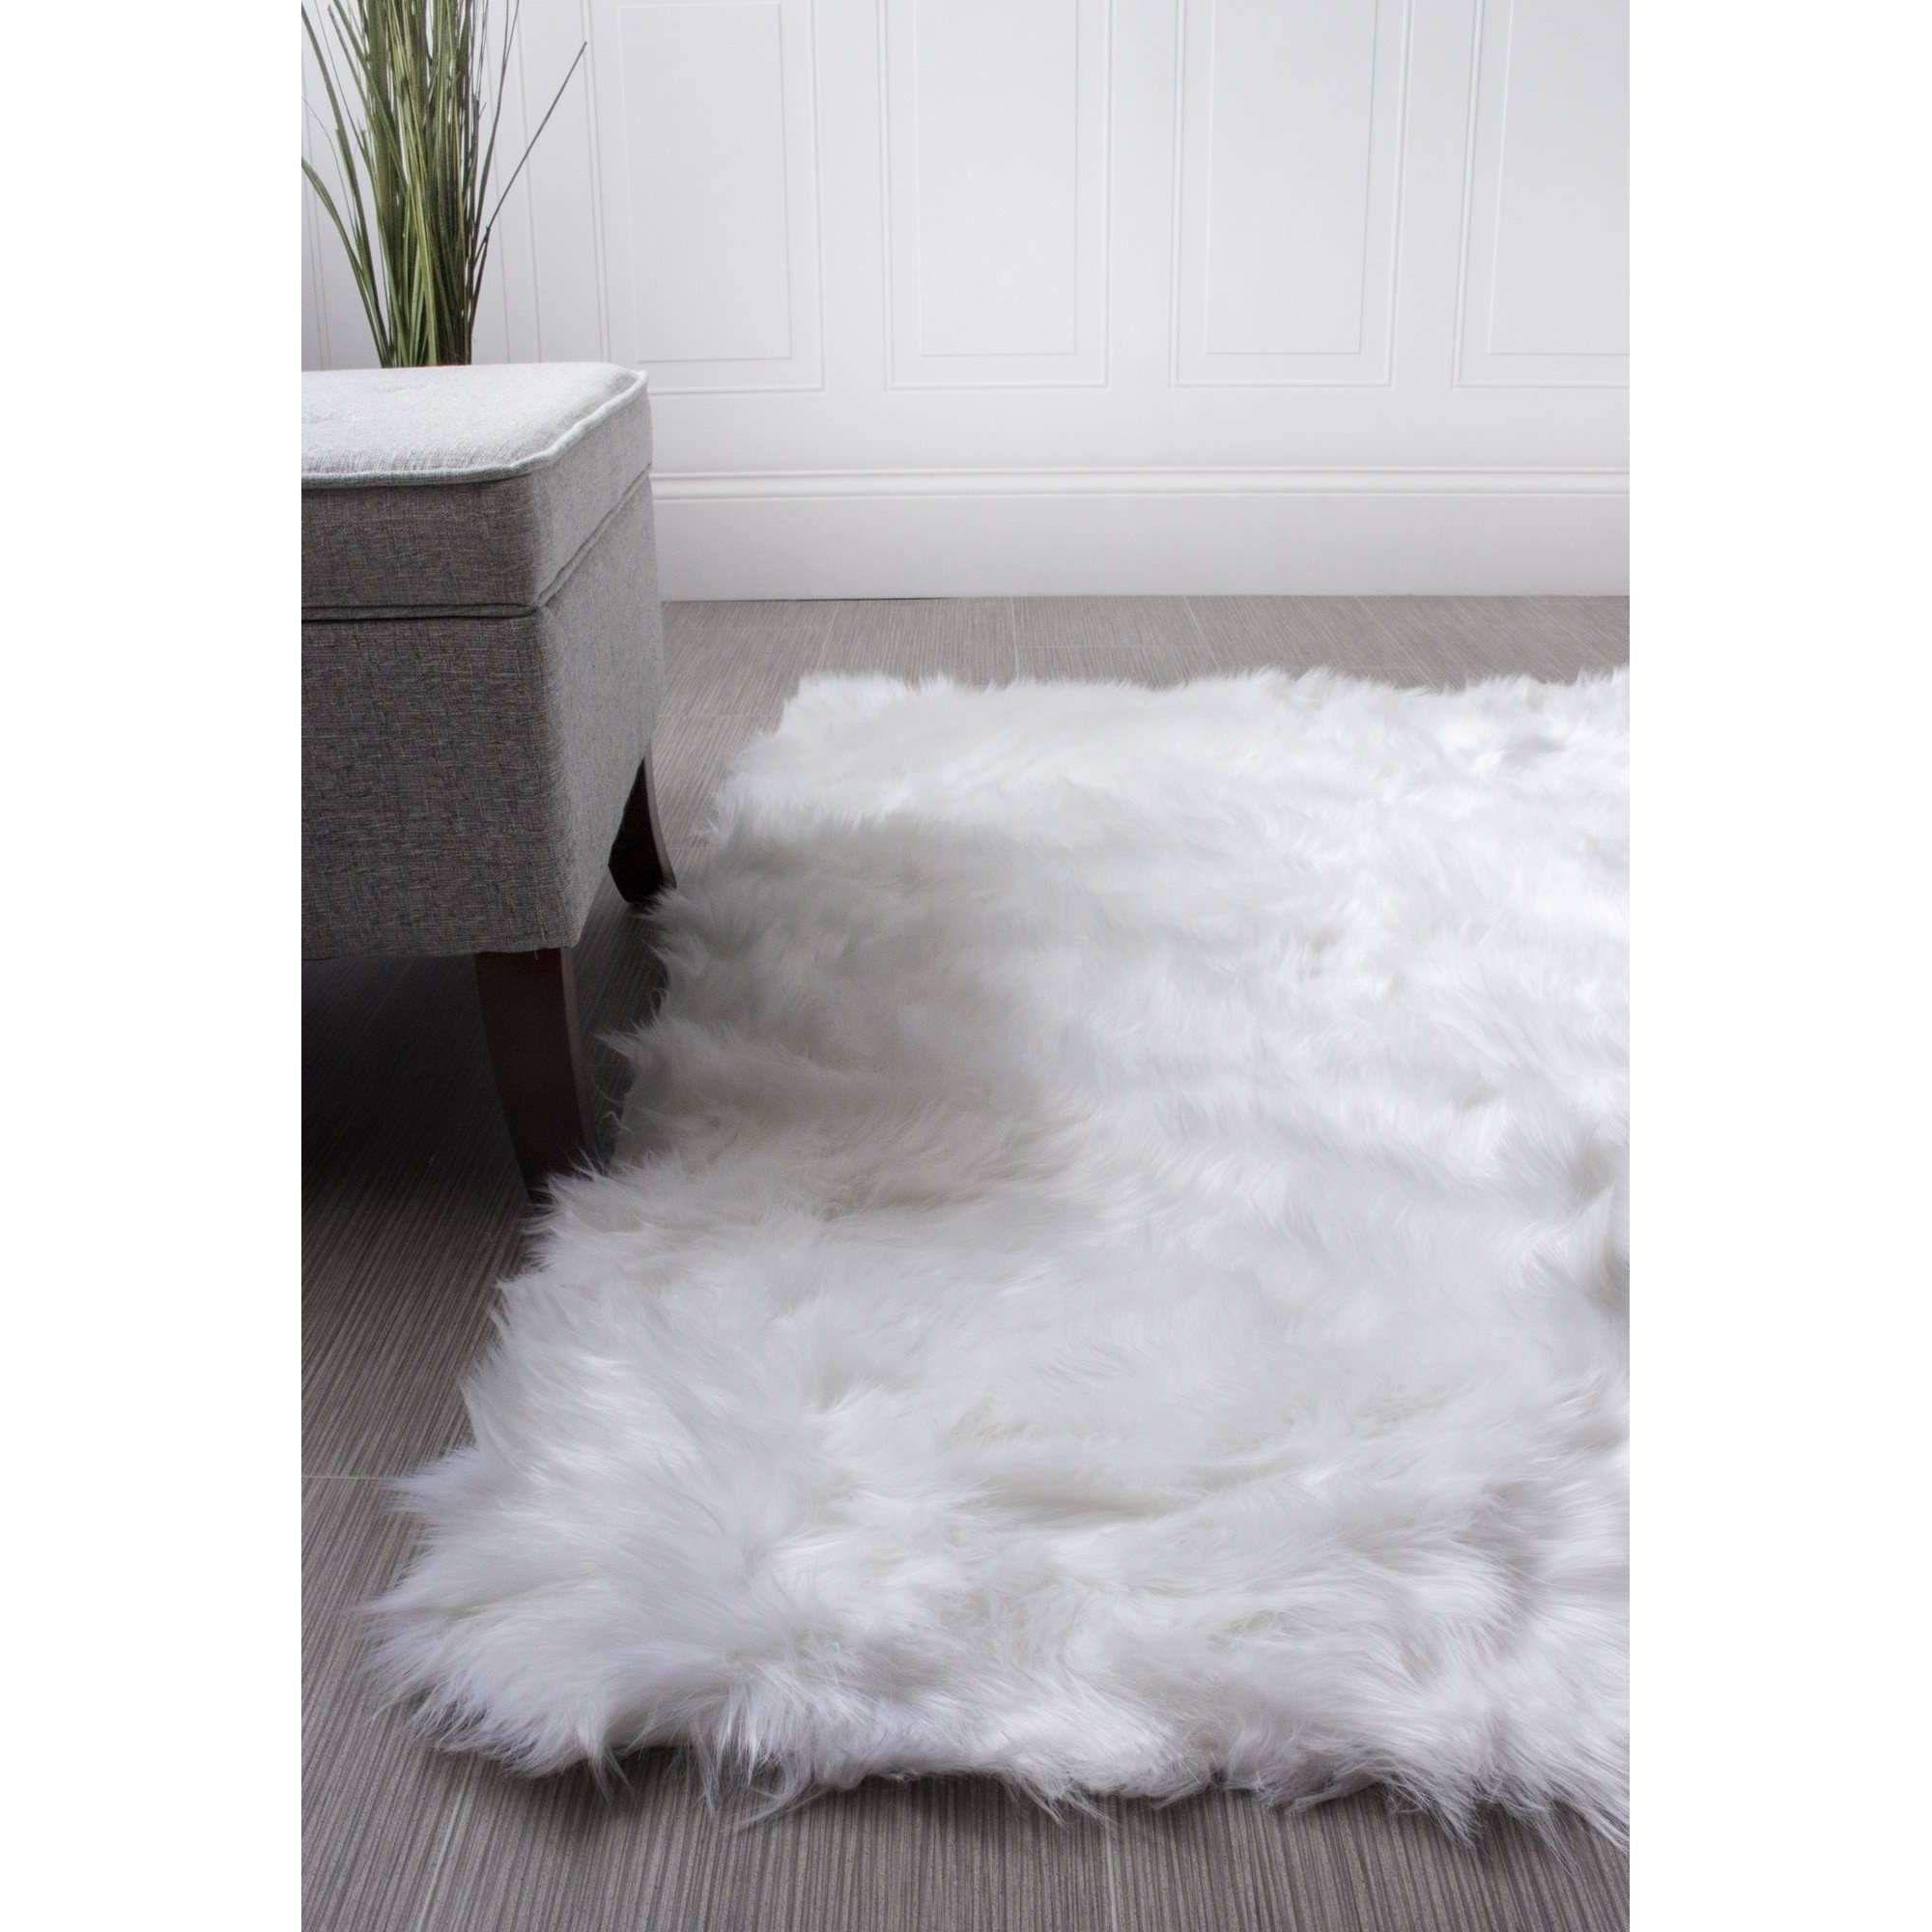 Serene Faux Soft Sheepskin Rug Ivory Childrens Room Rugs Faux Sheepskin Rug Fur Rug Bedroom